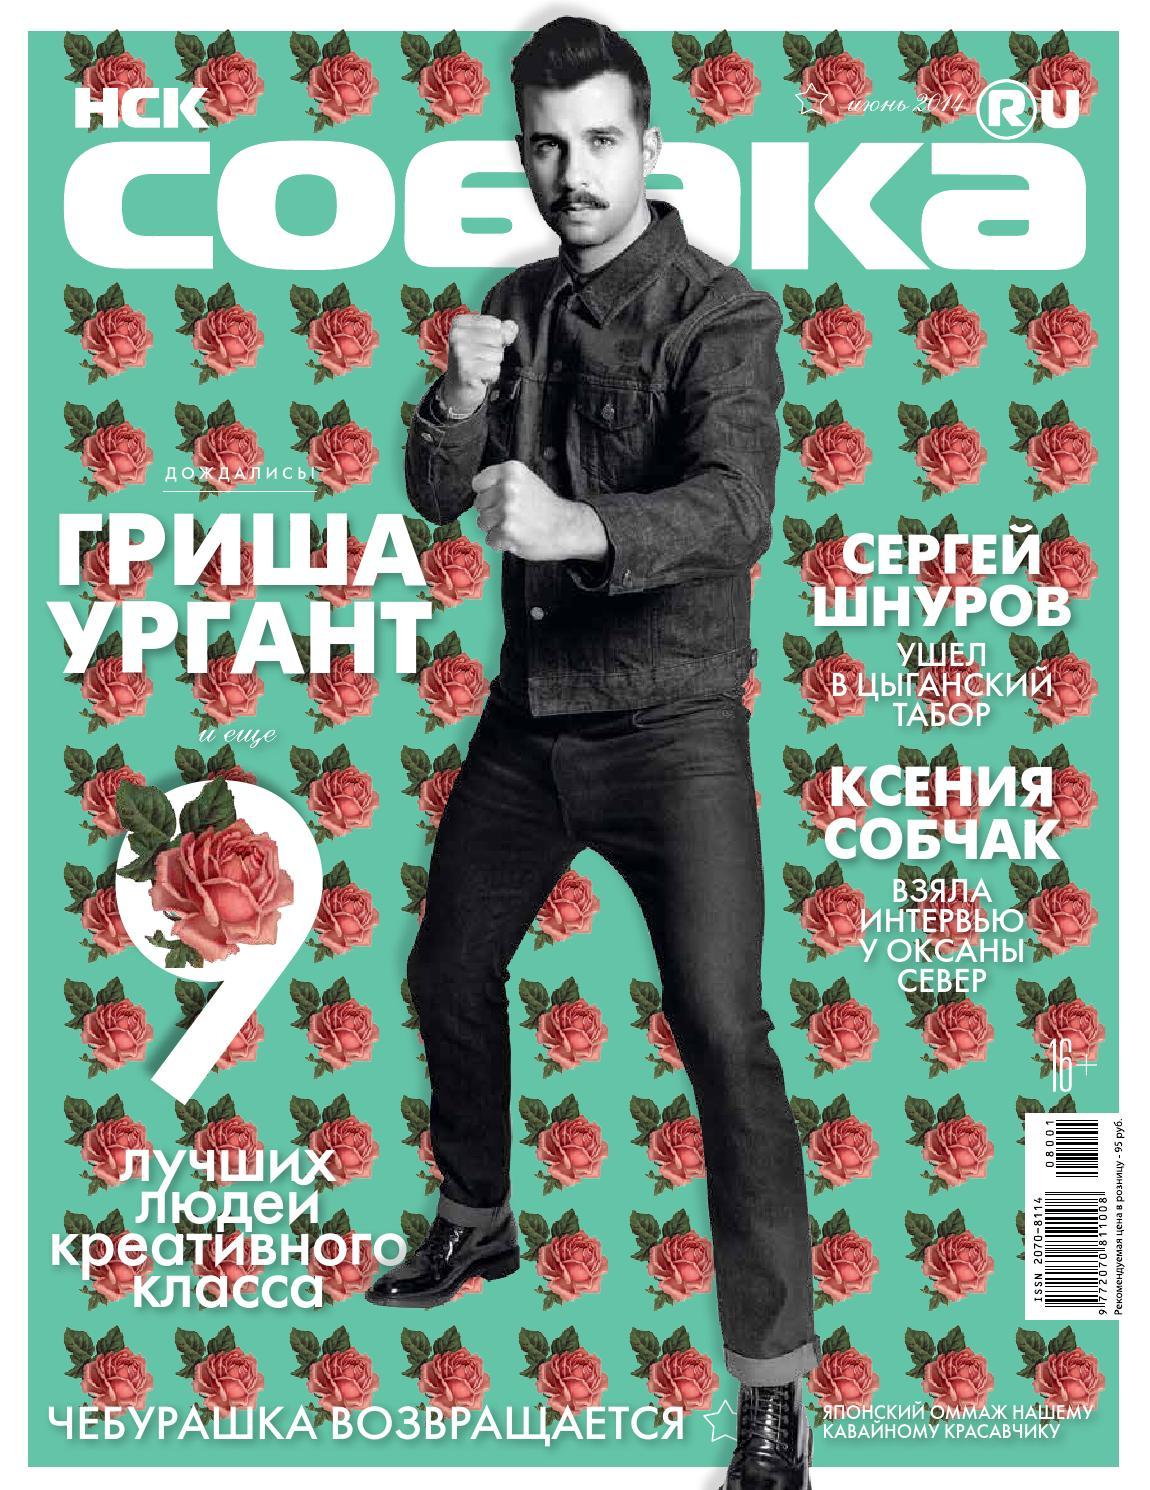 НСК.Собака.ru №66 by TOPMEDIA-NSK - issuu c72e530d90630